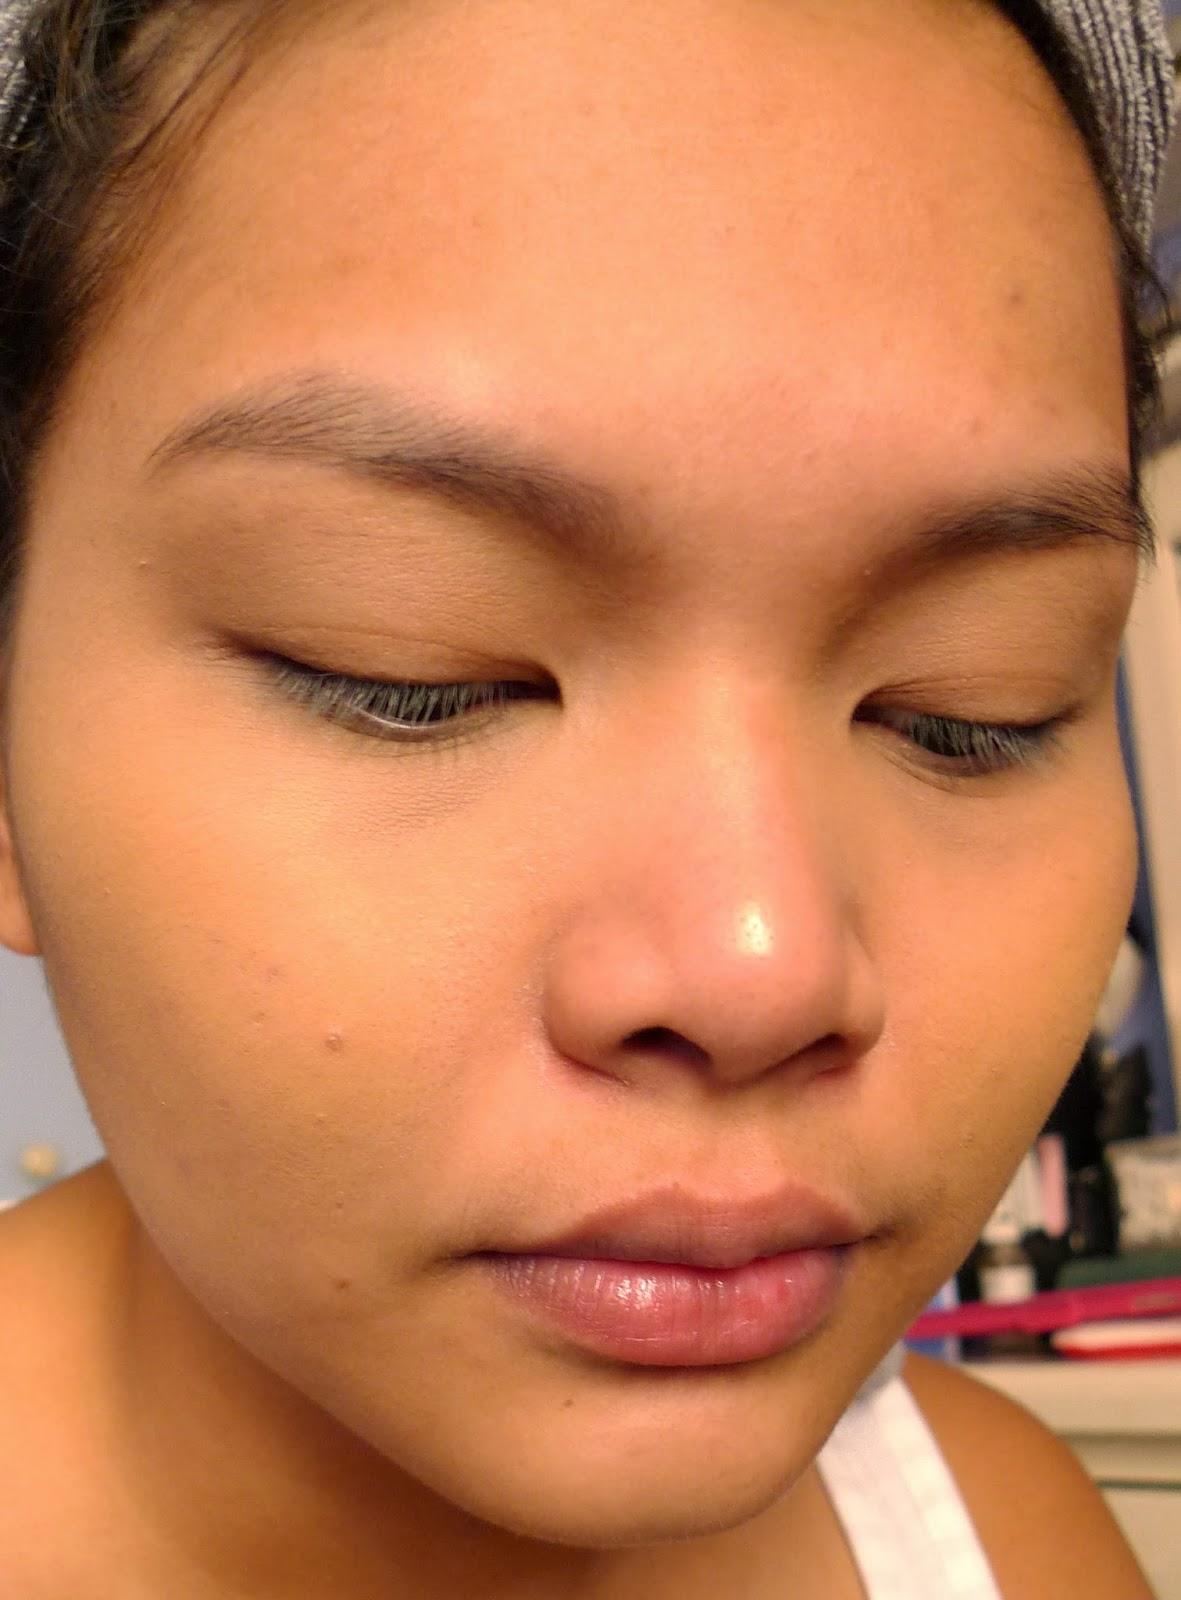 Dermalogica Sheer Tint In Medium Review The Beauty Junkee